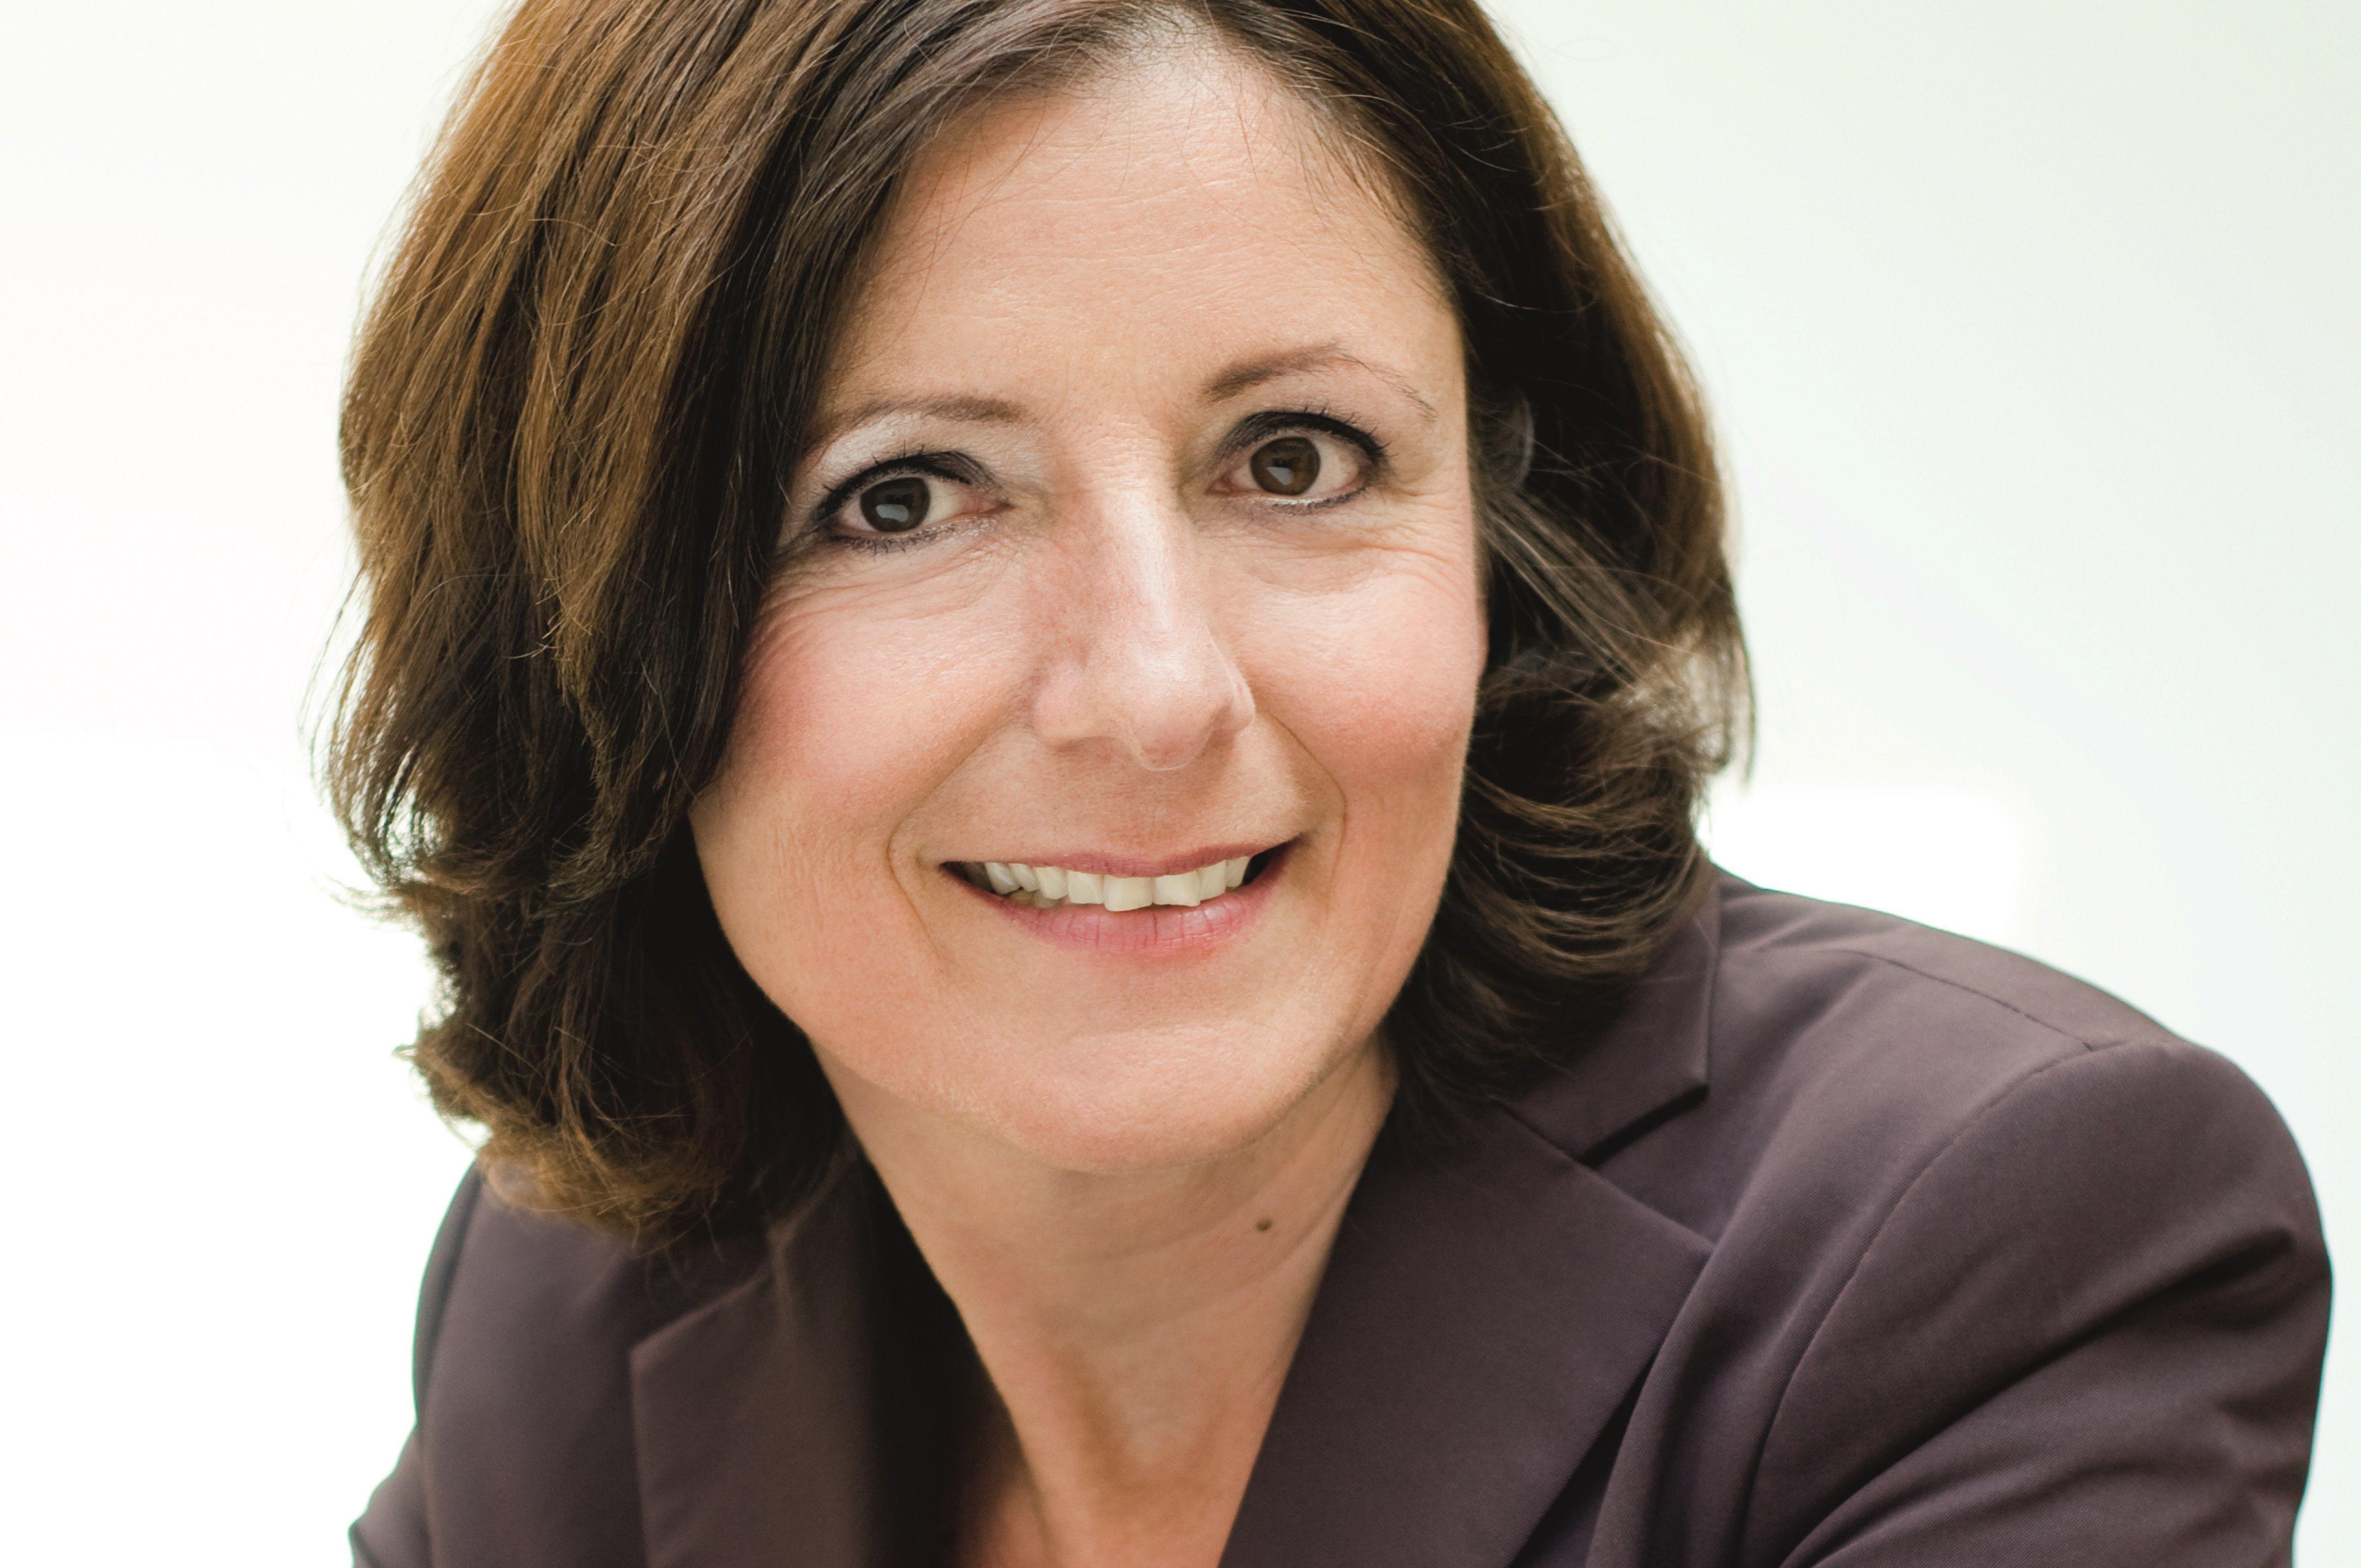 Malu Dreyer German And Austrian Female Politicians